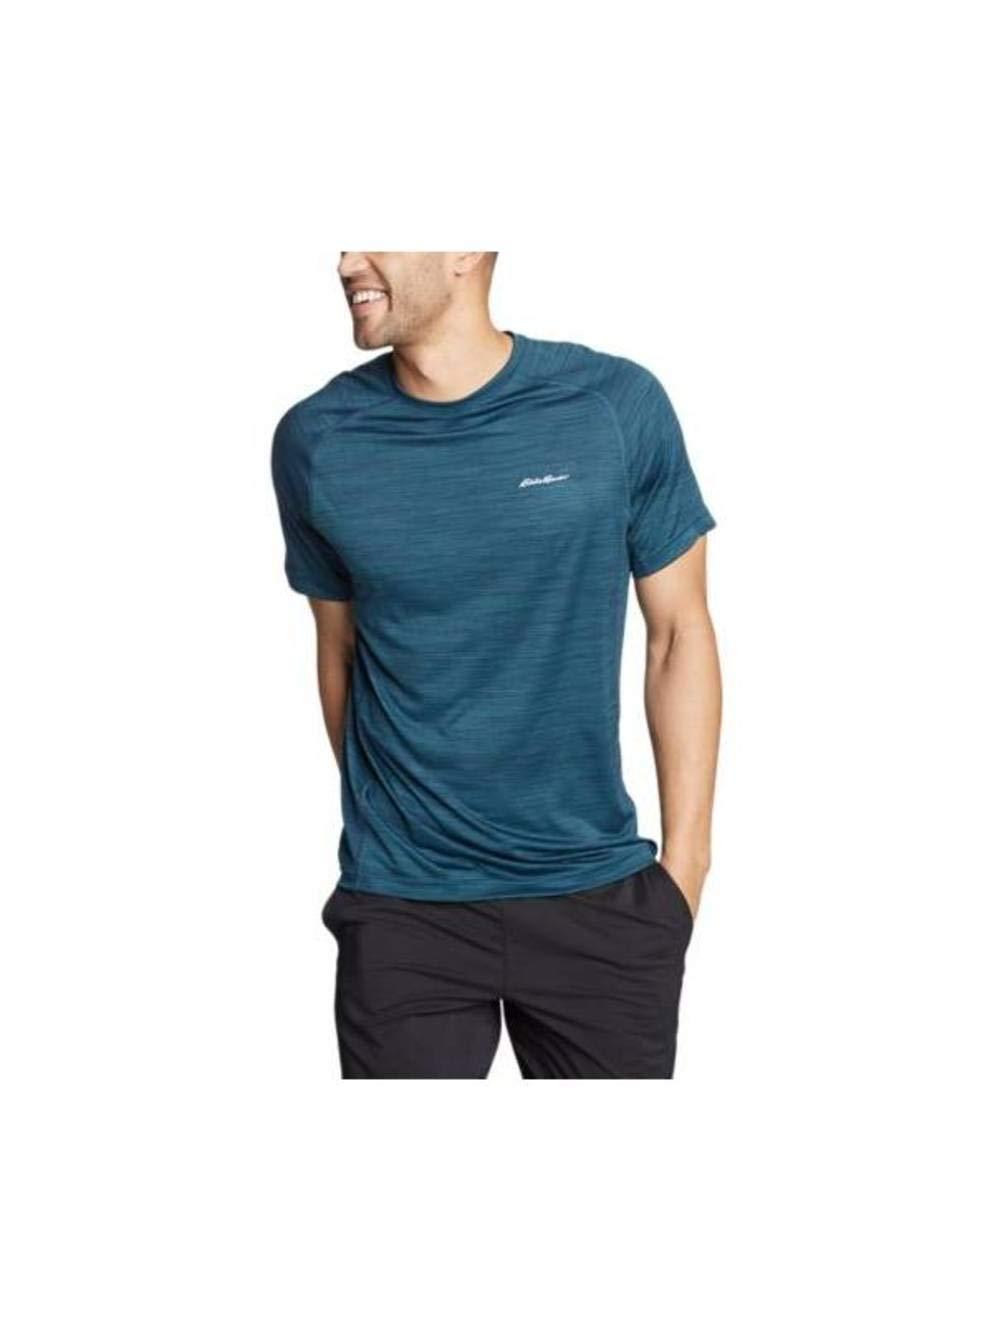 Eddie Bauer Men's Resolution Short-Sleeve T-Shirt, Mallard Regular S